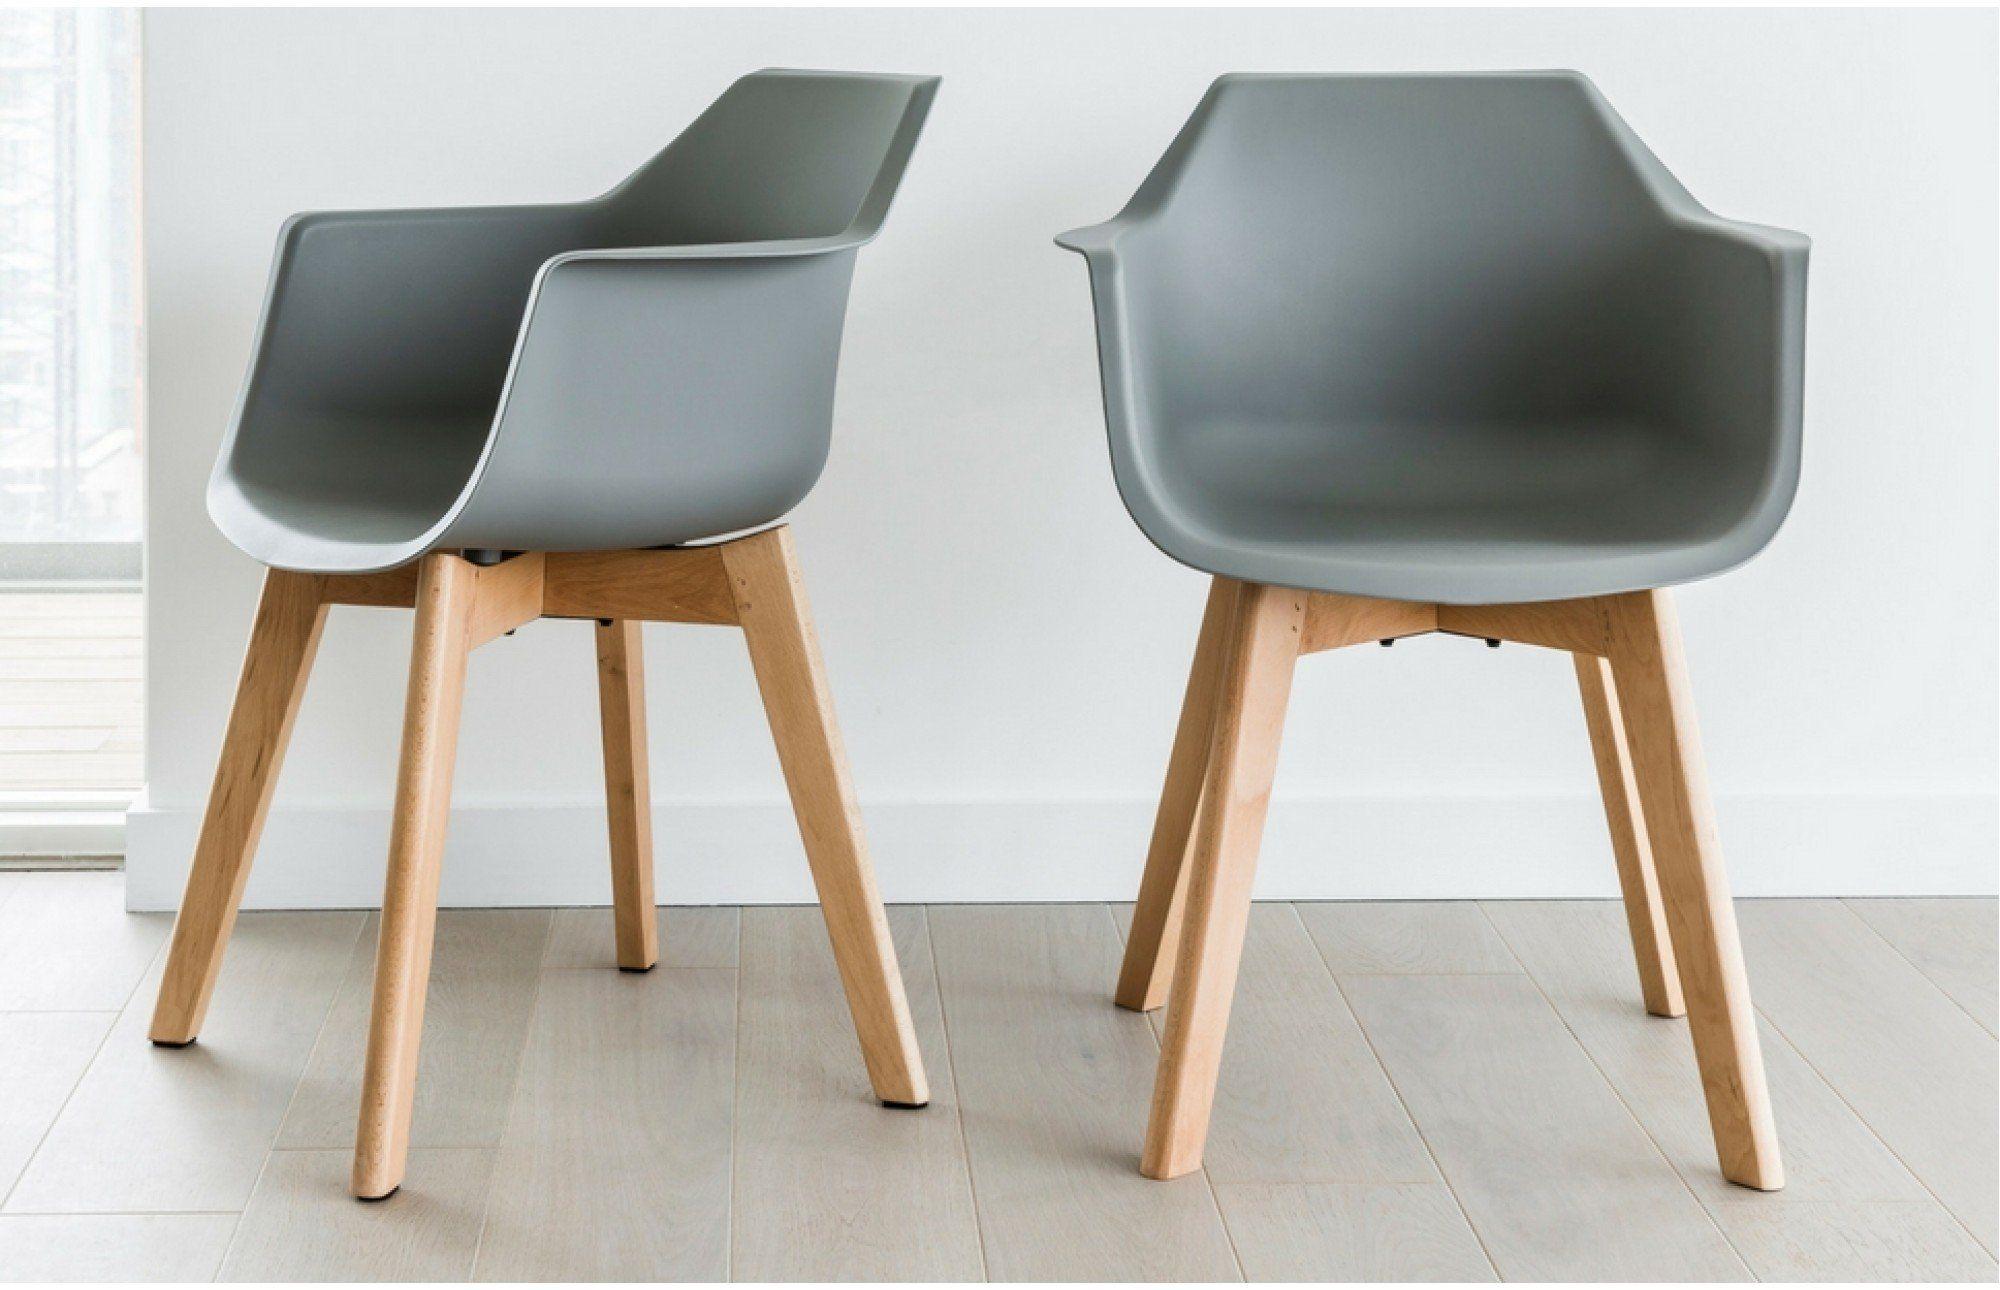 Surprising Amelia Grey Bucket Chairs Set Of 2 Dining Area Machost Co Dining Chair Design Ideas Machostcouk